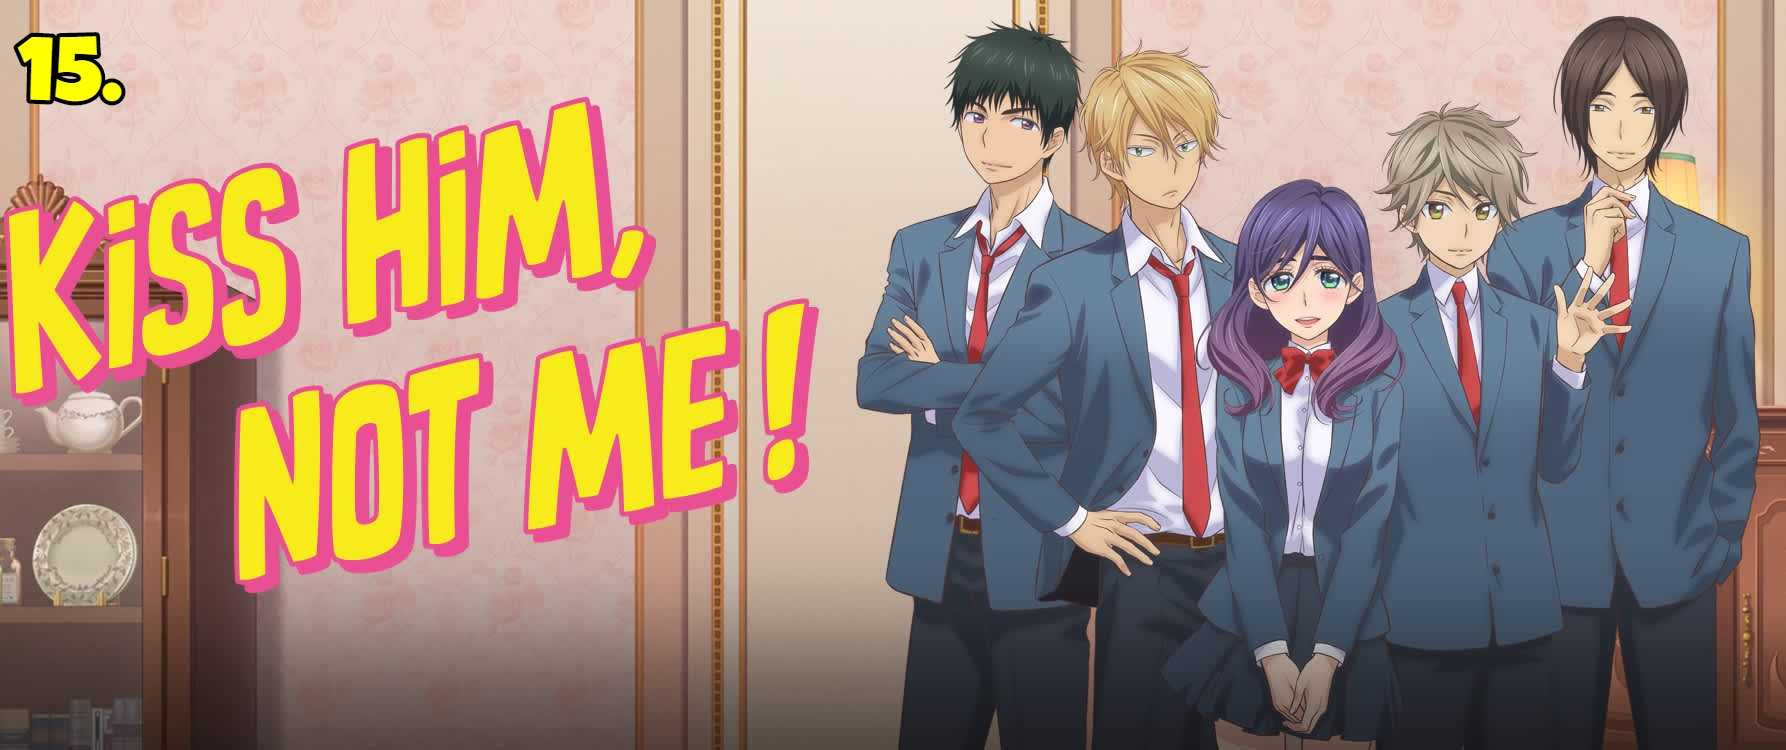 Watashi ga Motete Dousunda (Kiss Him, Not Me!)